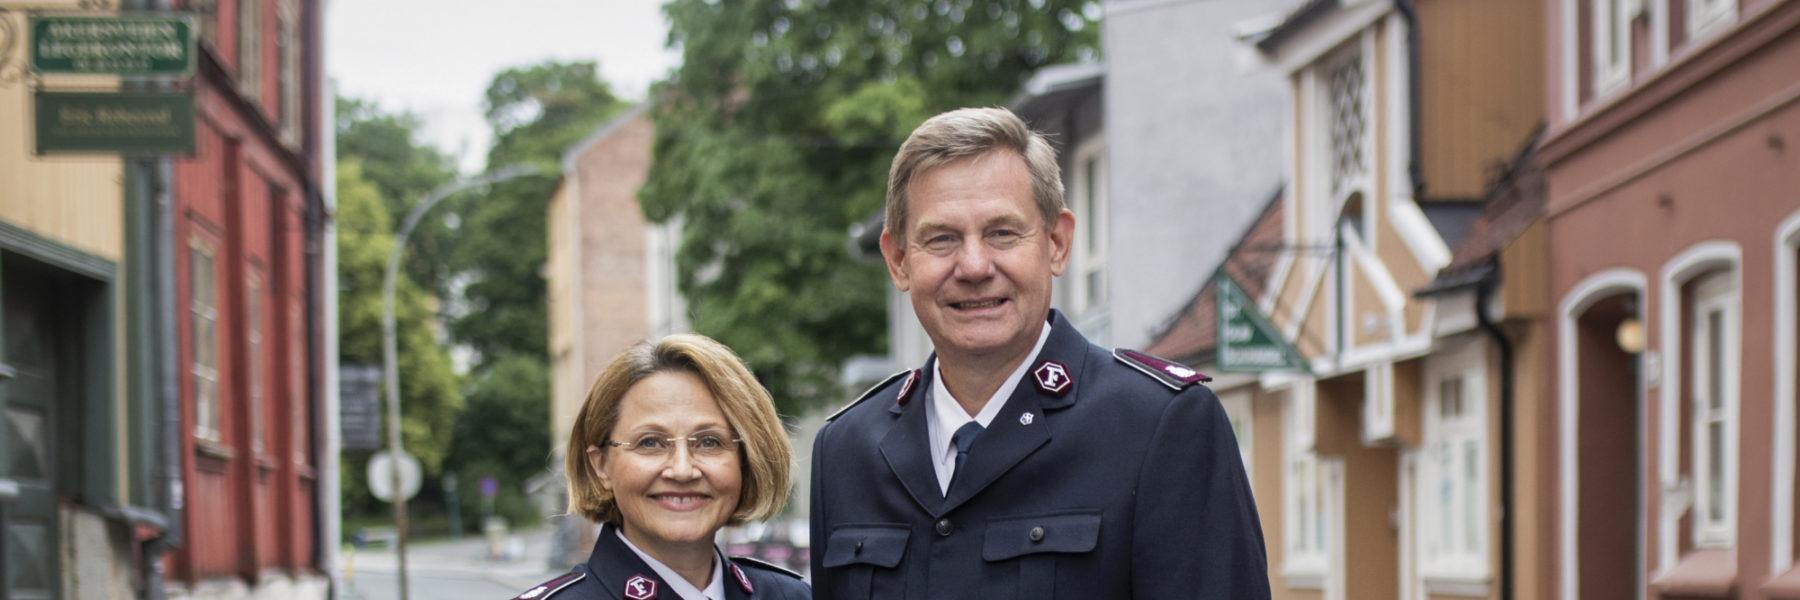 Kommandør Lisbeth og Knud David Welander 3 nett